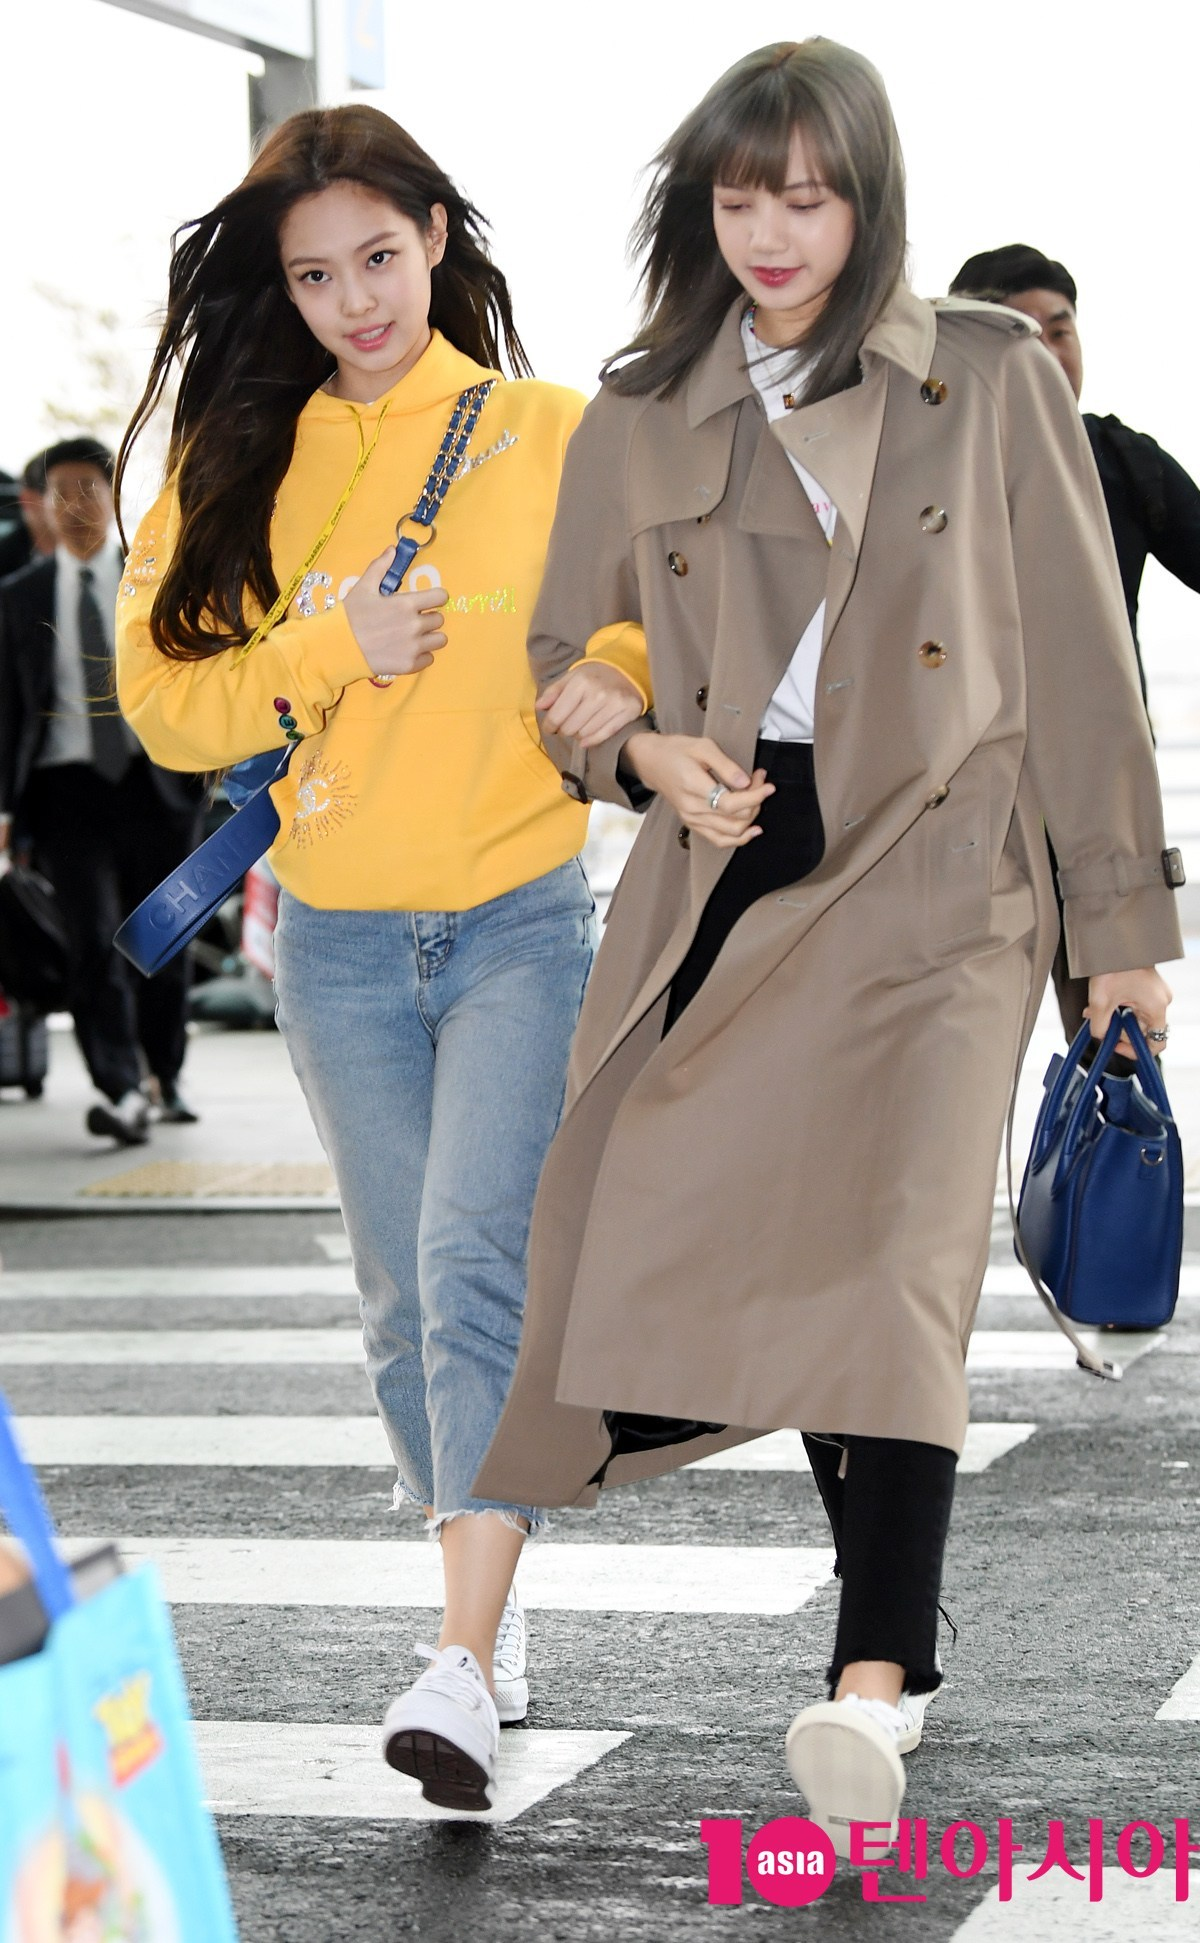 4-BLACKPINK-Jennie-airport-Photo-9-April-2019-Incheon-to-Thailand